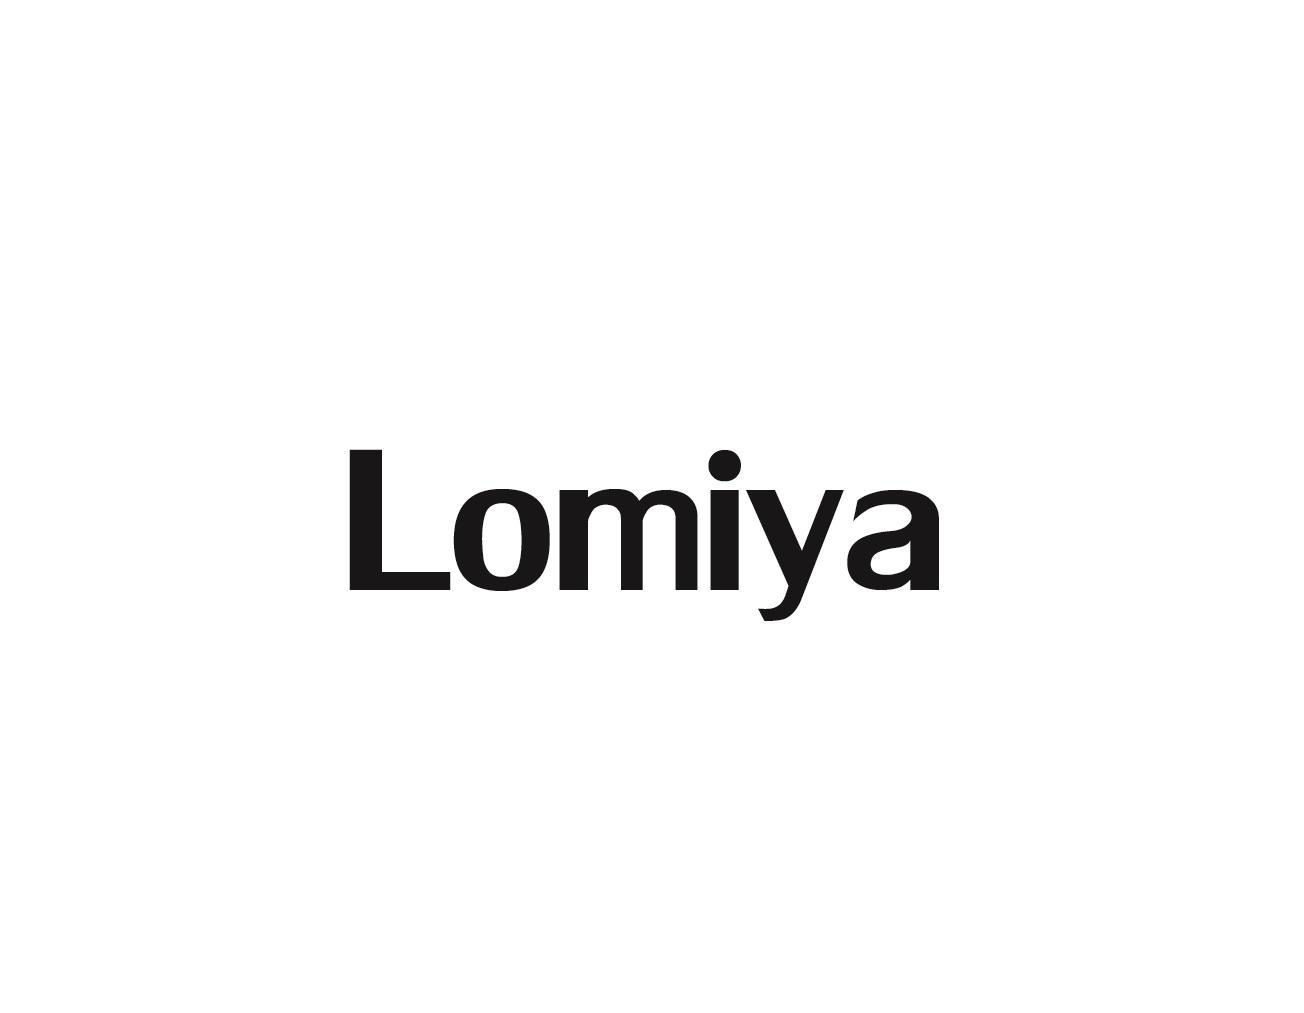 LOMIYA